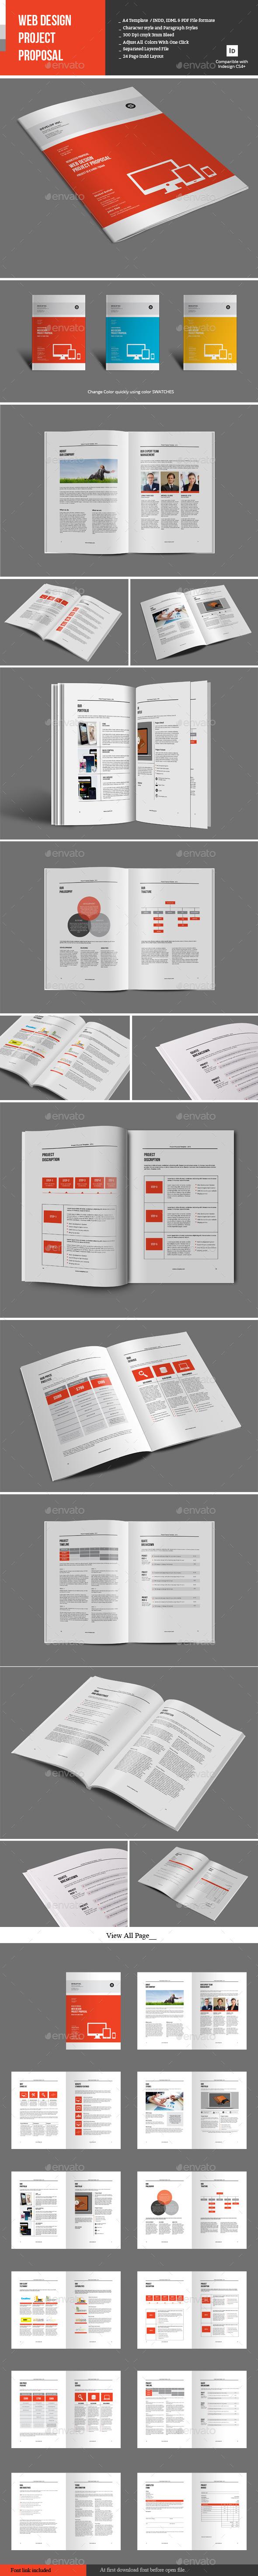 GraphicRiver Web Design Project Proposal 9816033